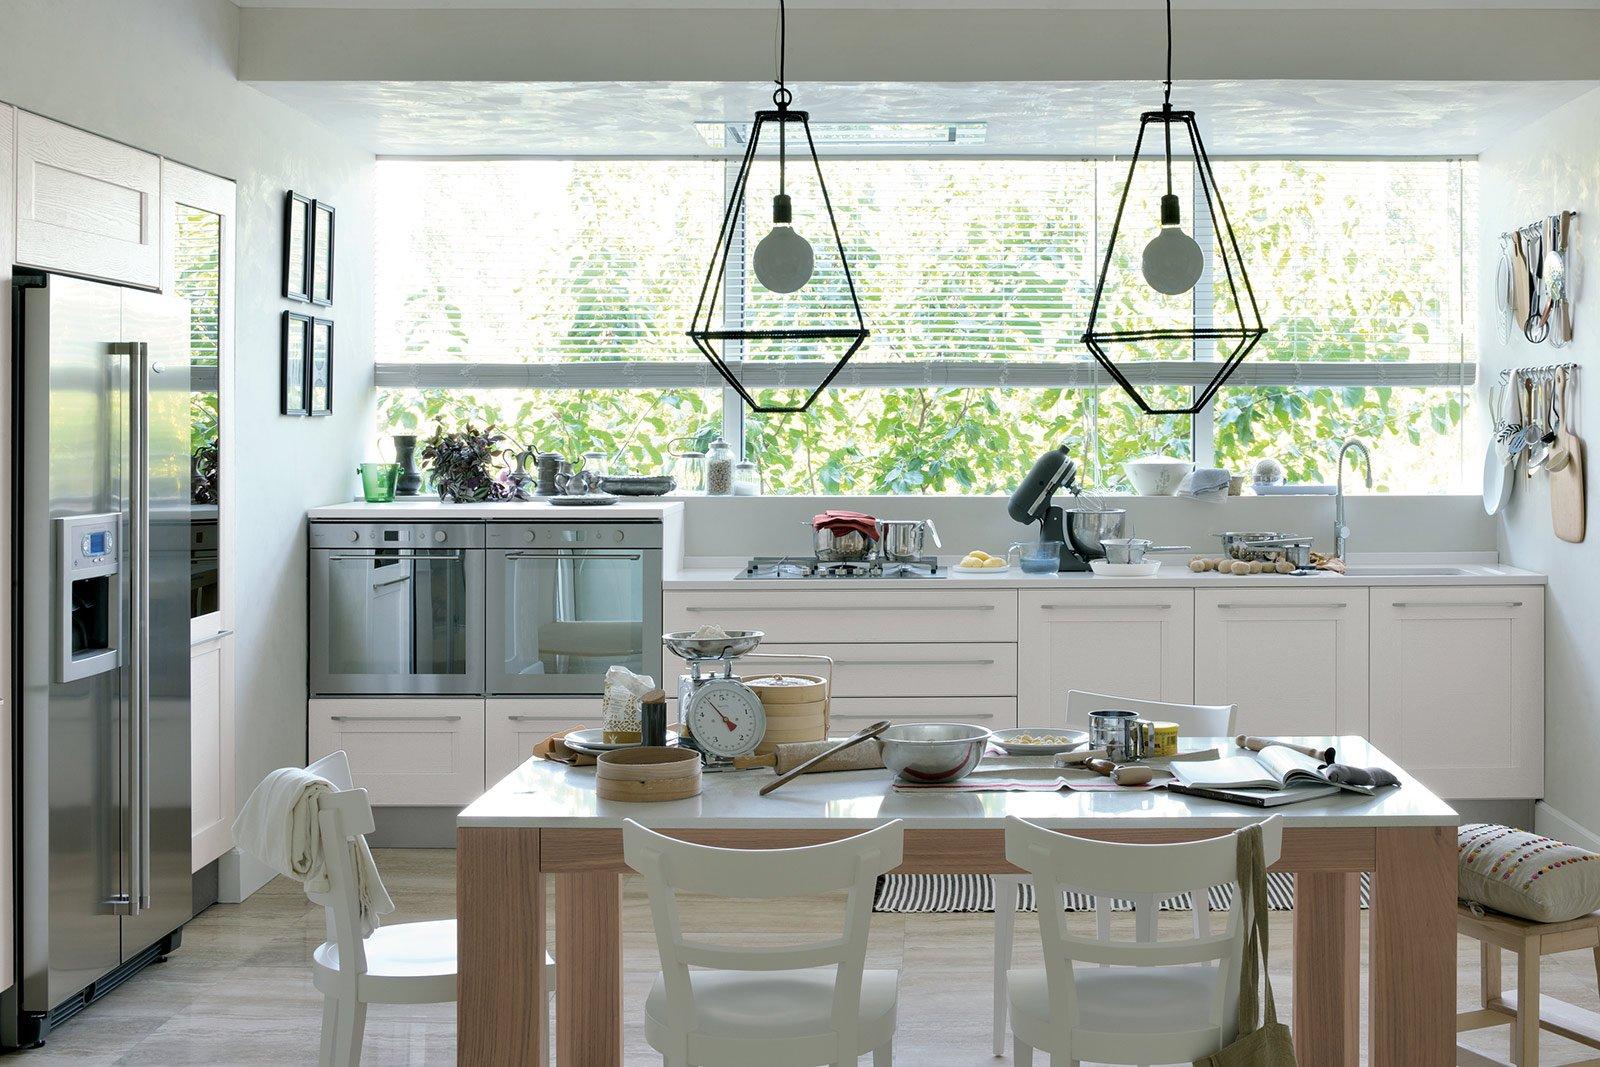 Beautiful Cucina Acciaio Inox Ikea Ideas - Ideas & Design 2017 ...